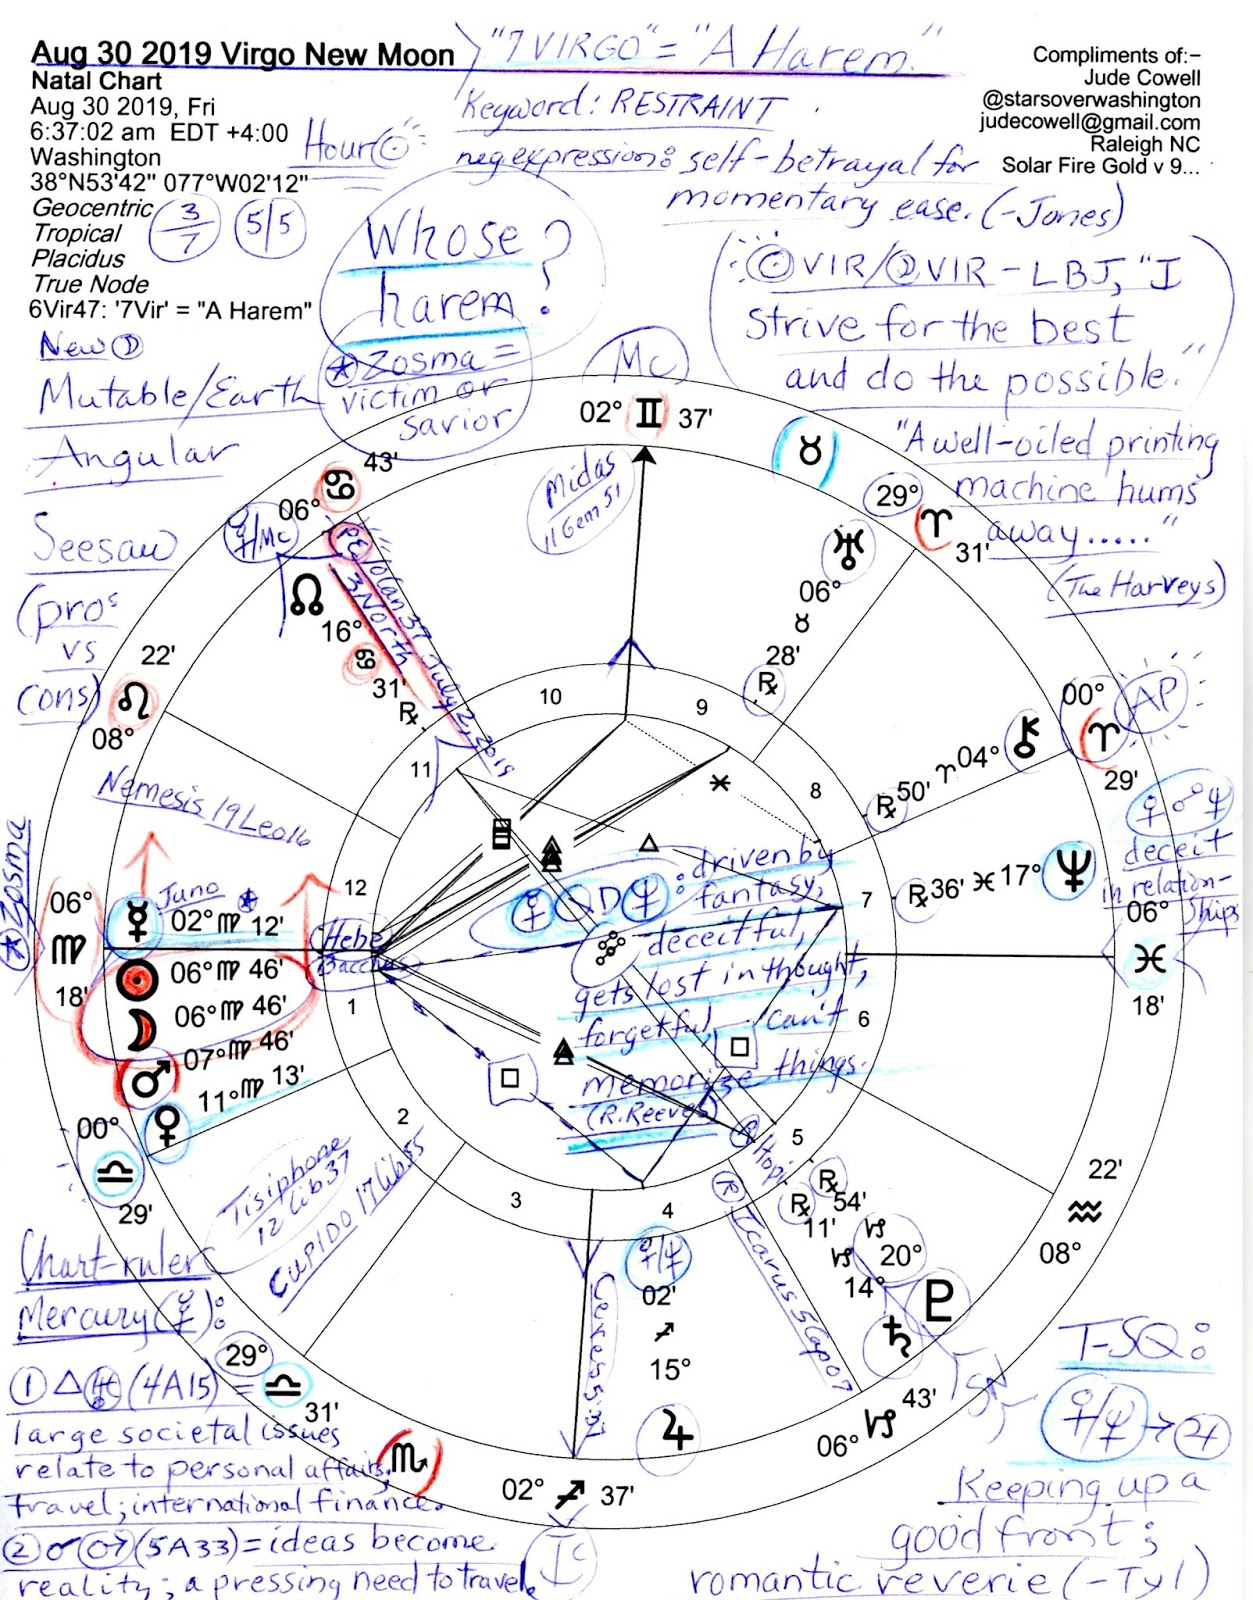 Stars Over Washington Dc Horoscope Aug 30 2019 Virgo New Moon